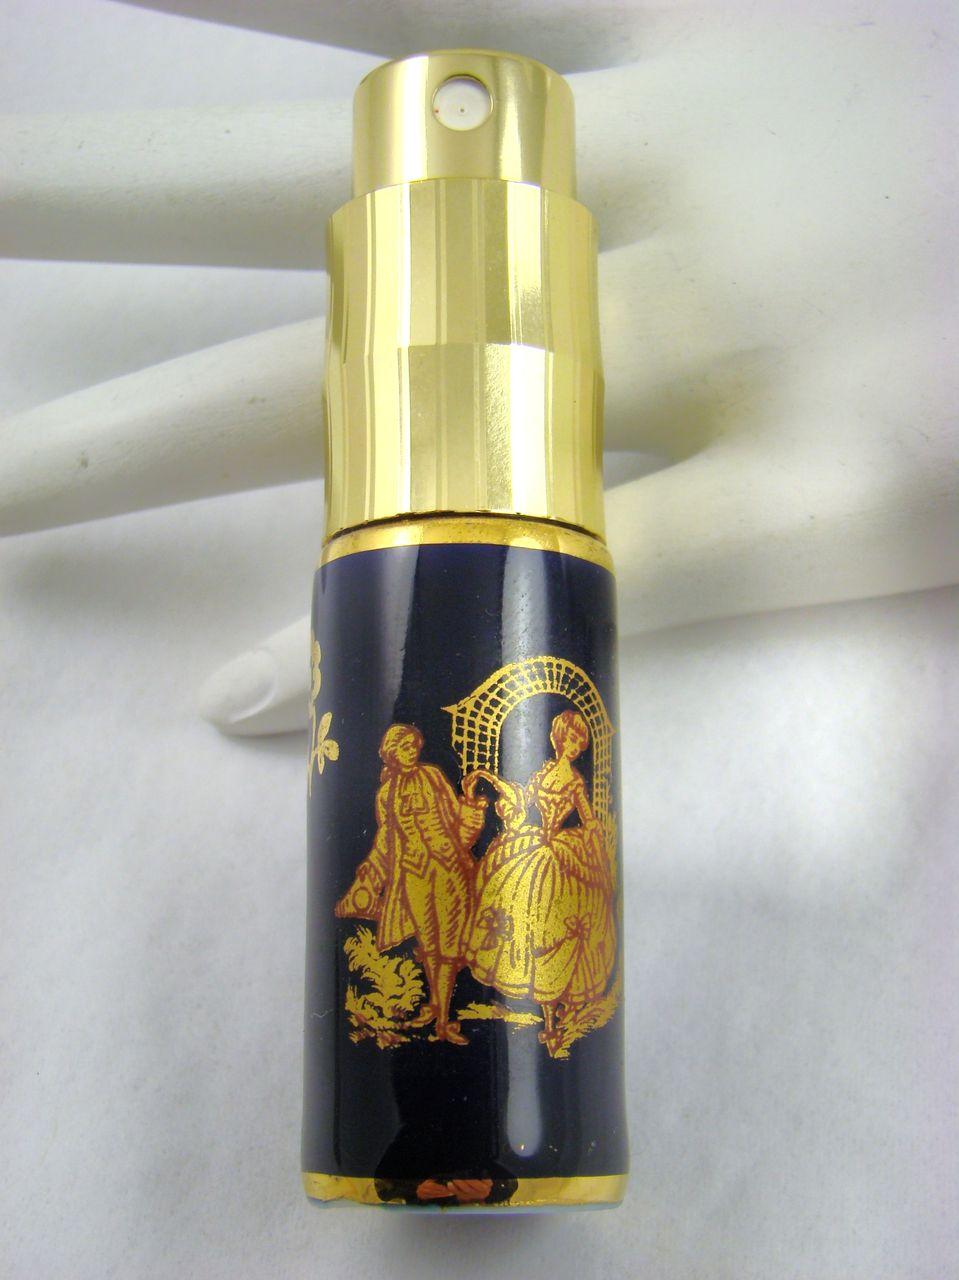 Limoges Porcelain Pump Spray Perfume Bottle